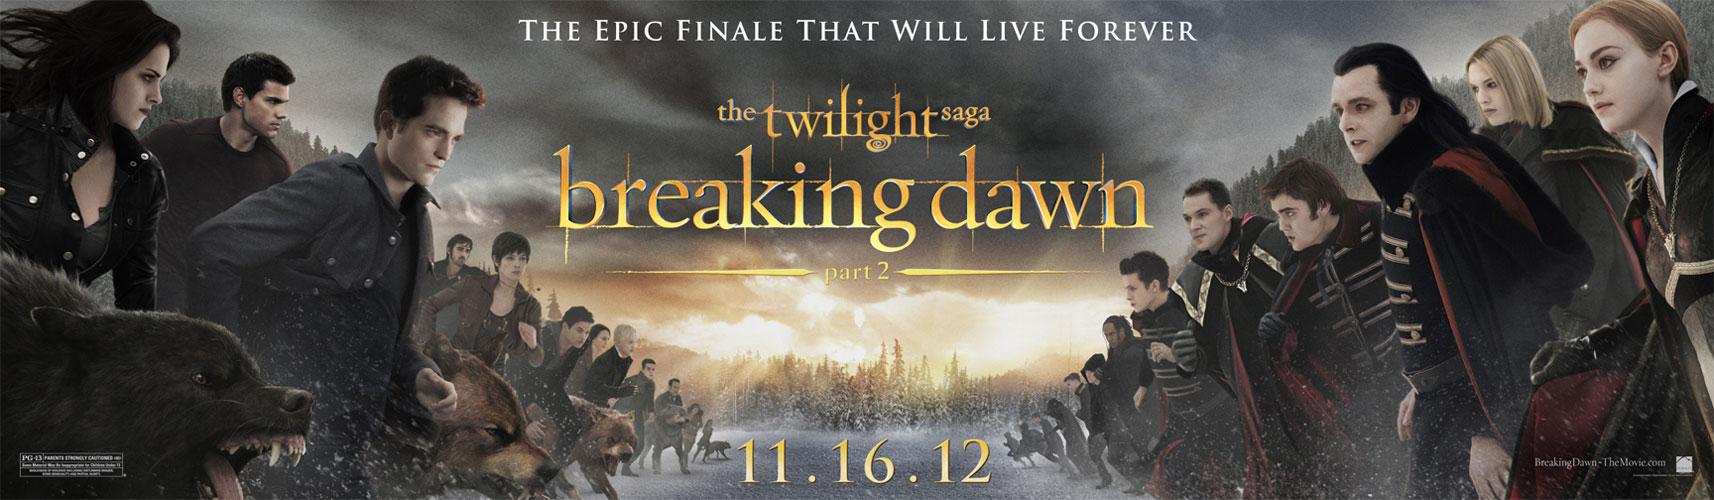 ����the twilight saga breaking dawn � part 2 poster 1